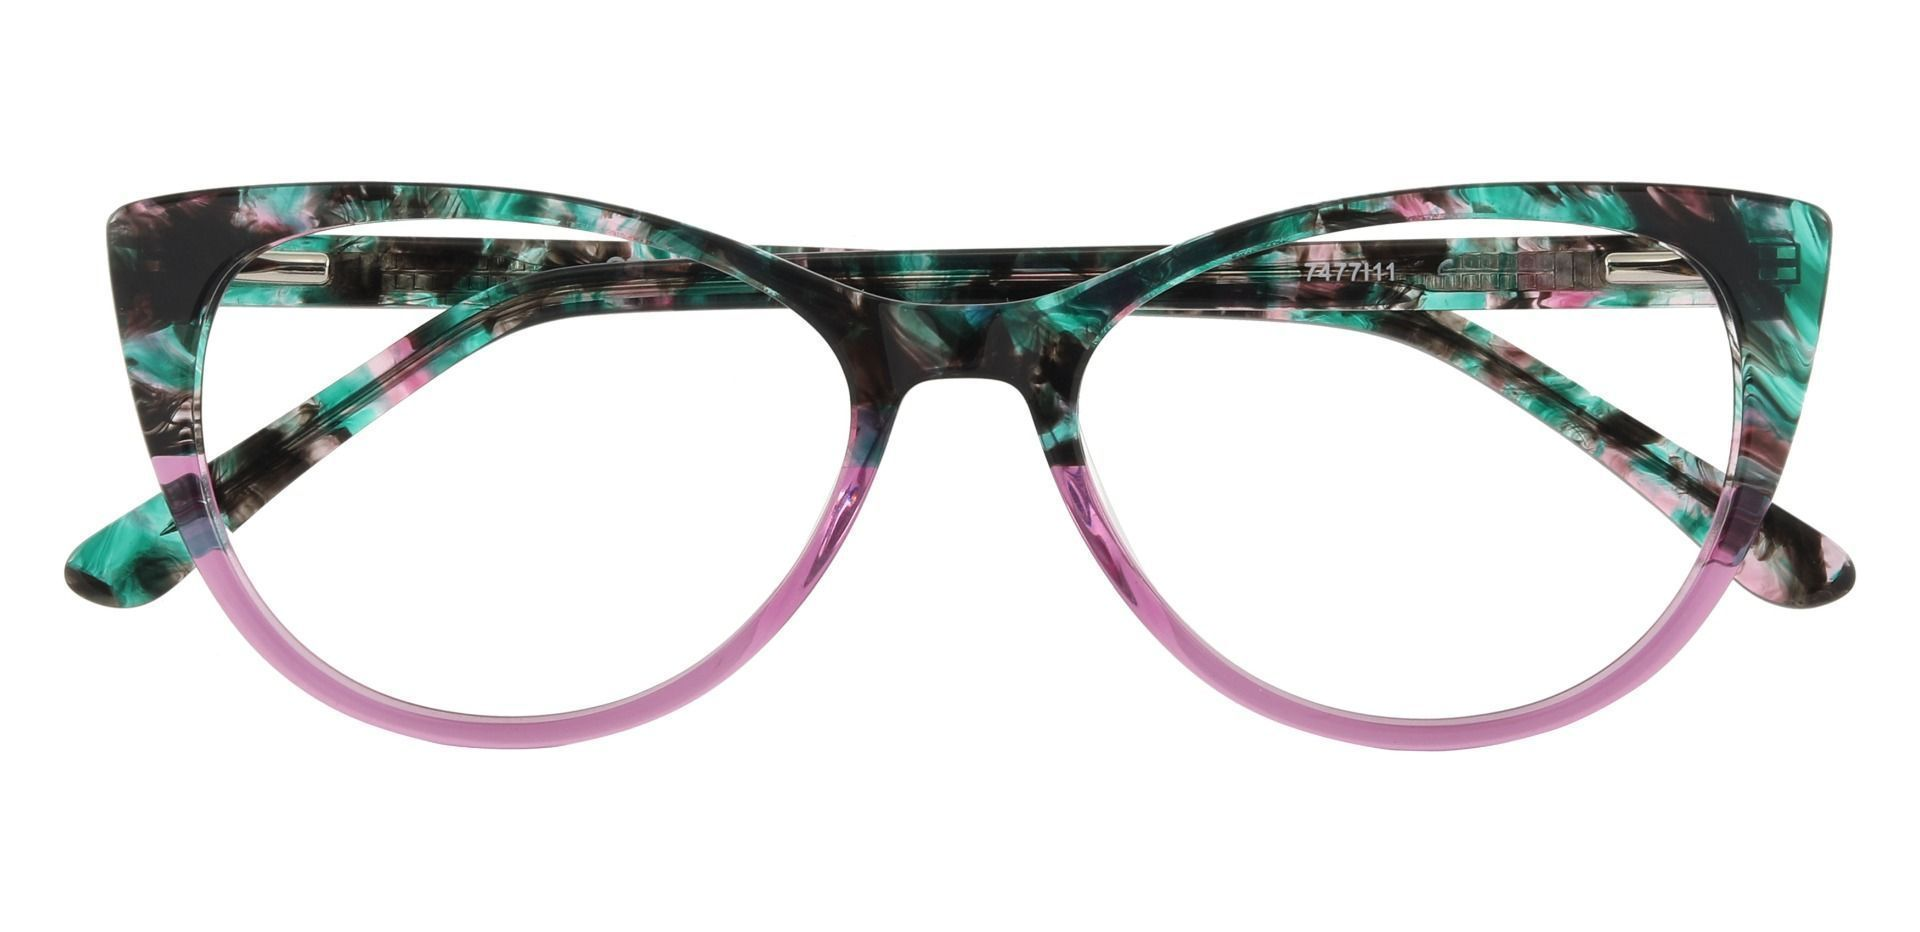 Valmora Oval Prescription Glasses - Pink